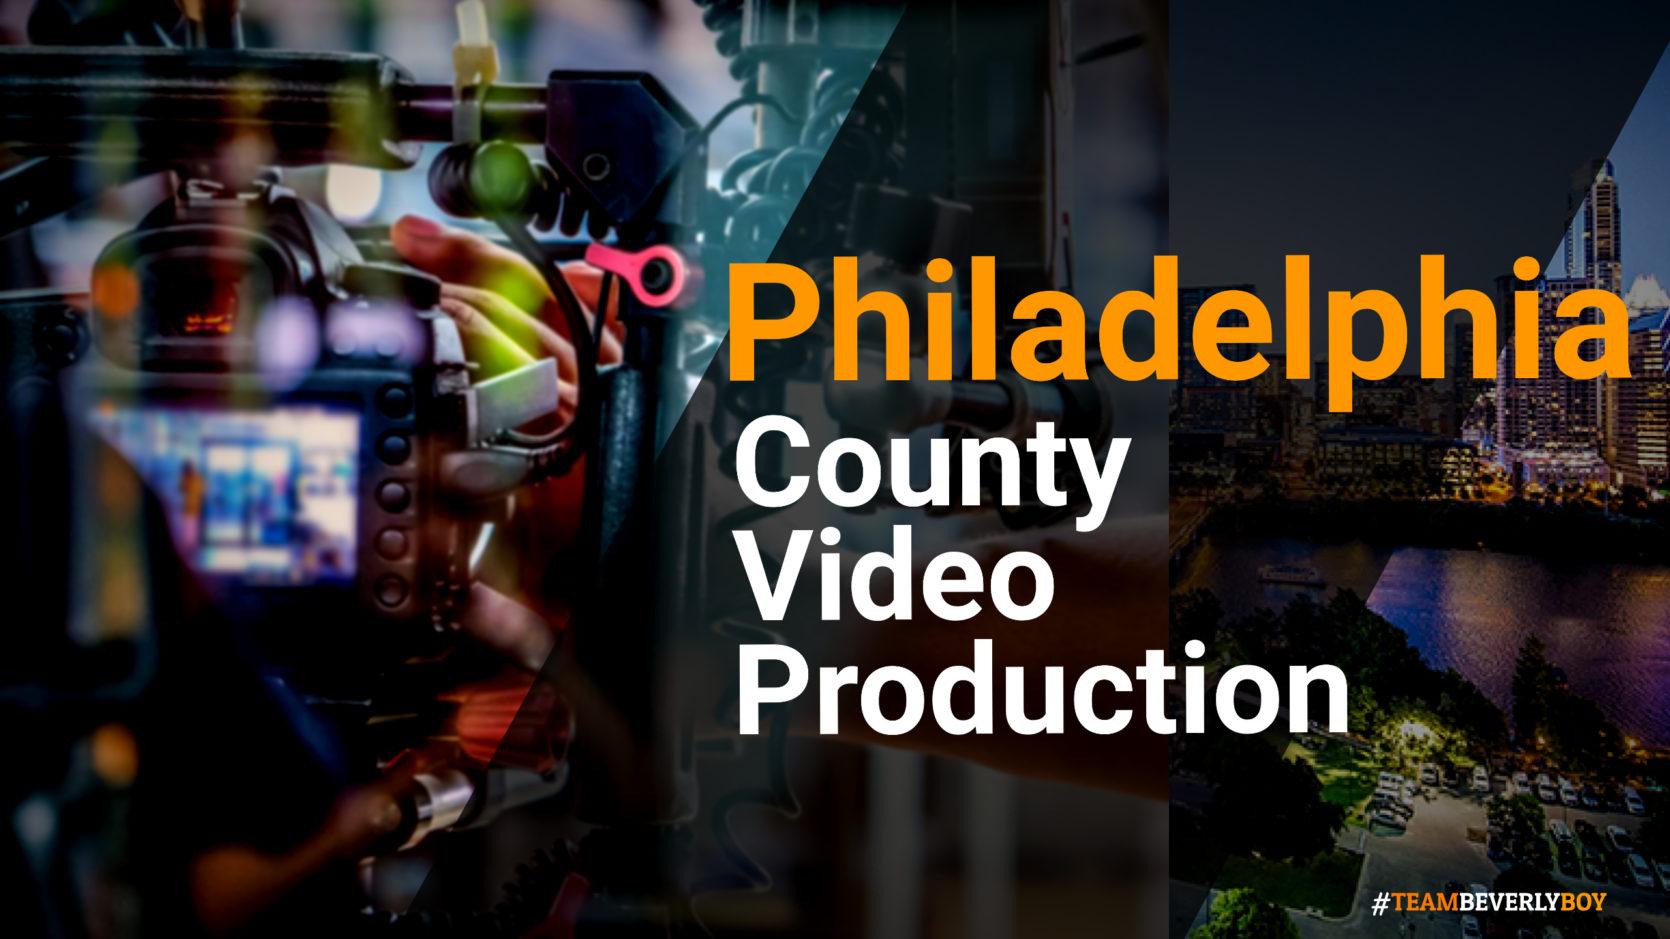 Philadelphia County Video Production